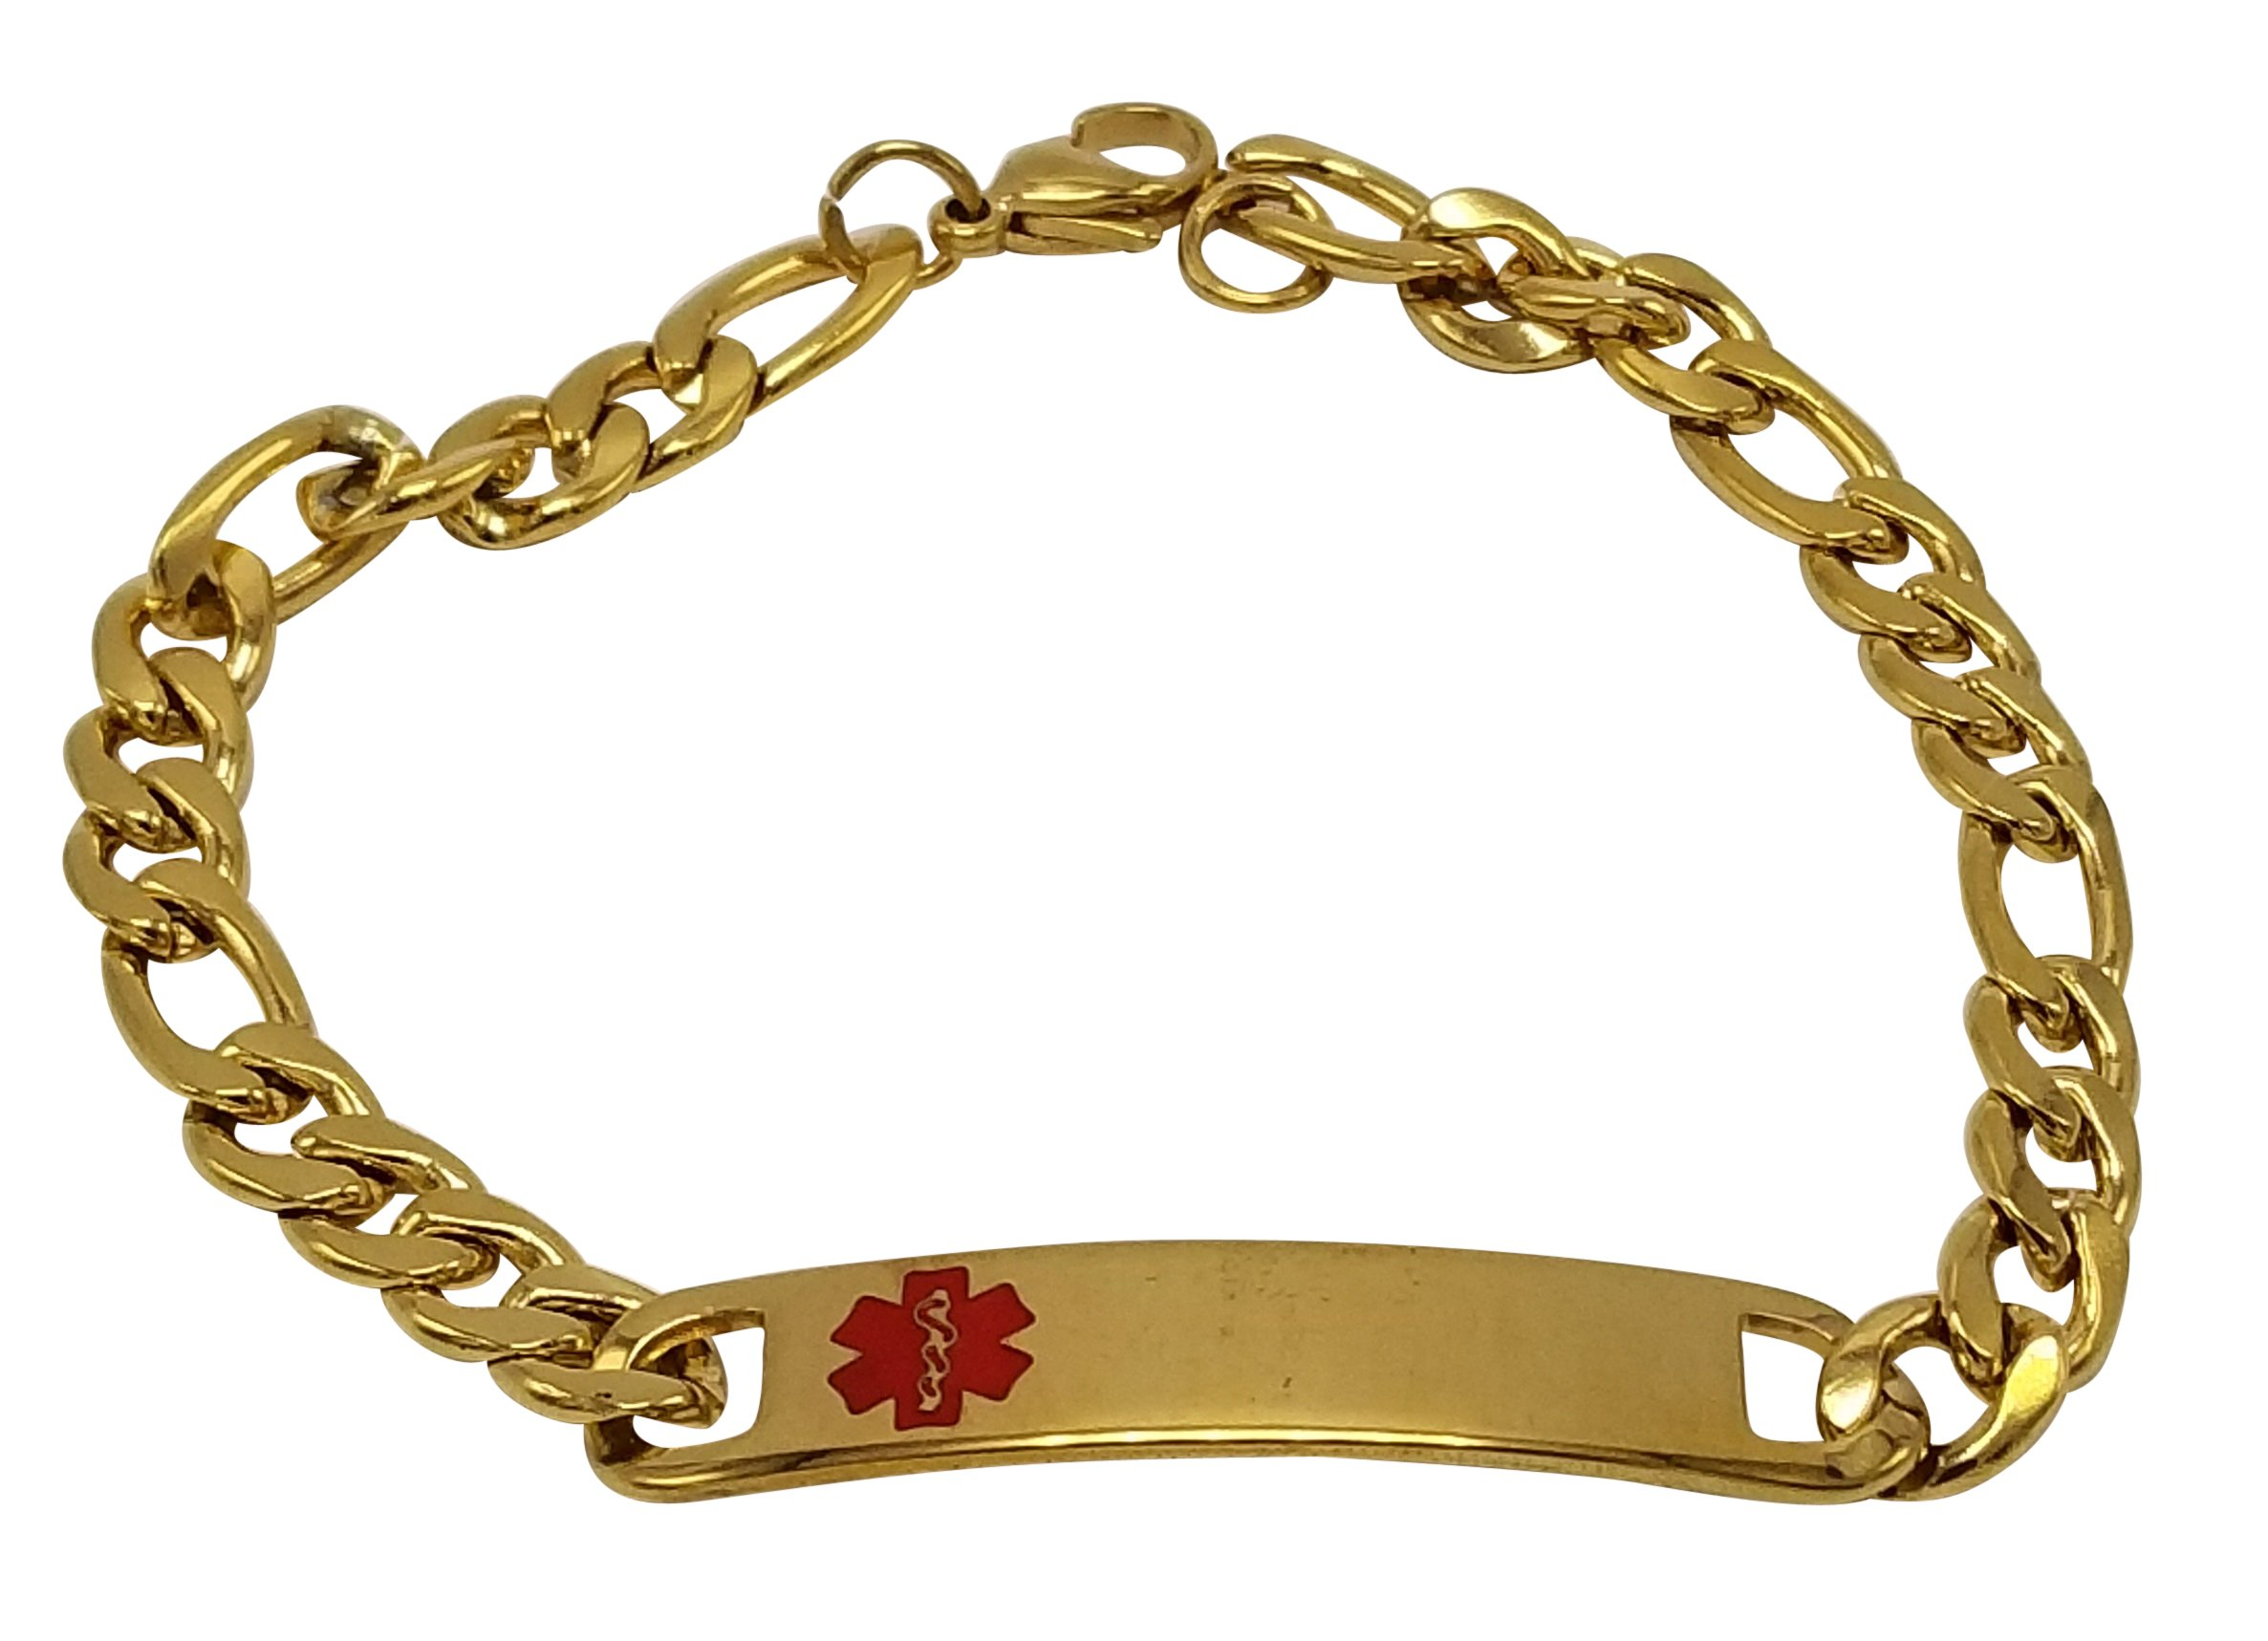 JGFinds TYPE 2 Diabetes Medical Alert Engraved Gold Over Stainless Steel Bracelet, 8 inch